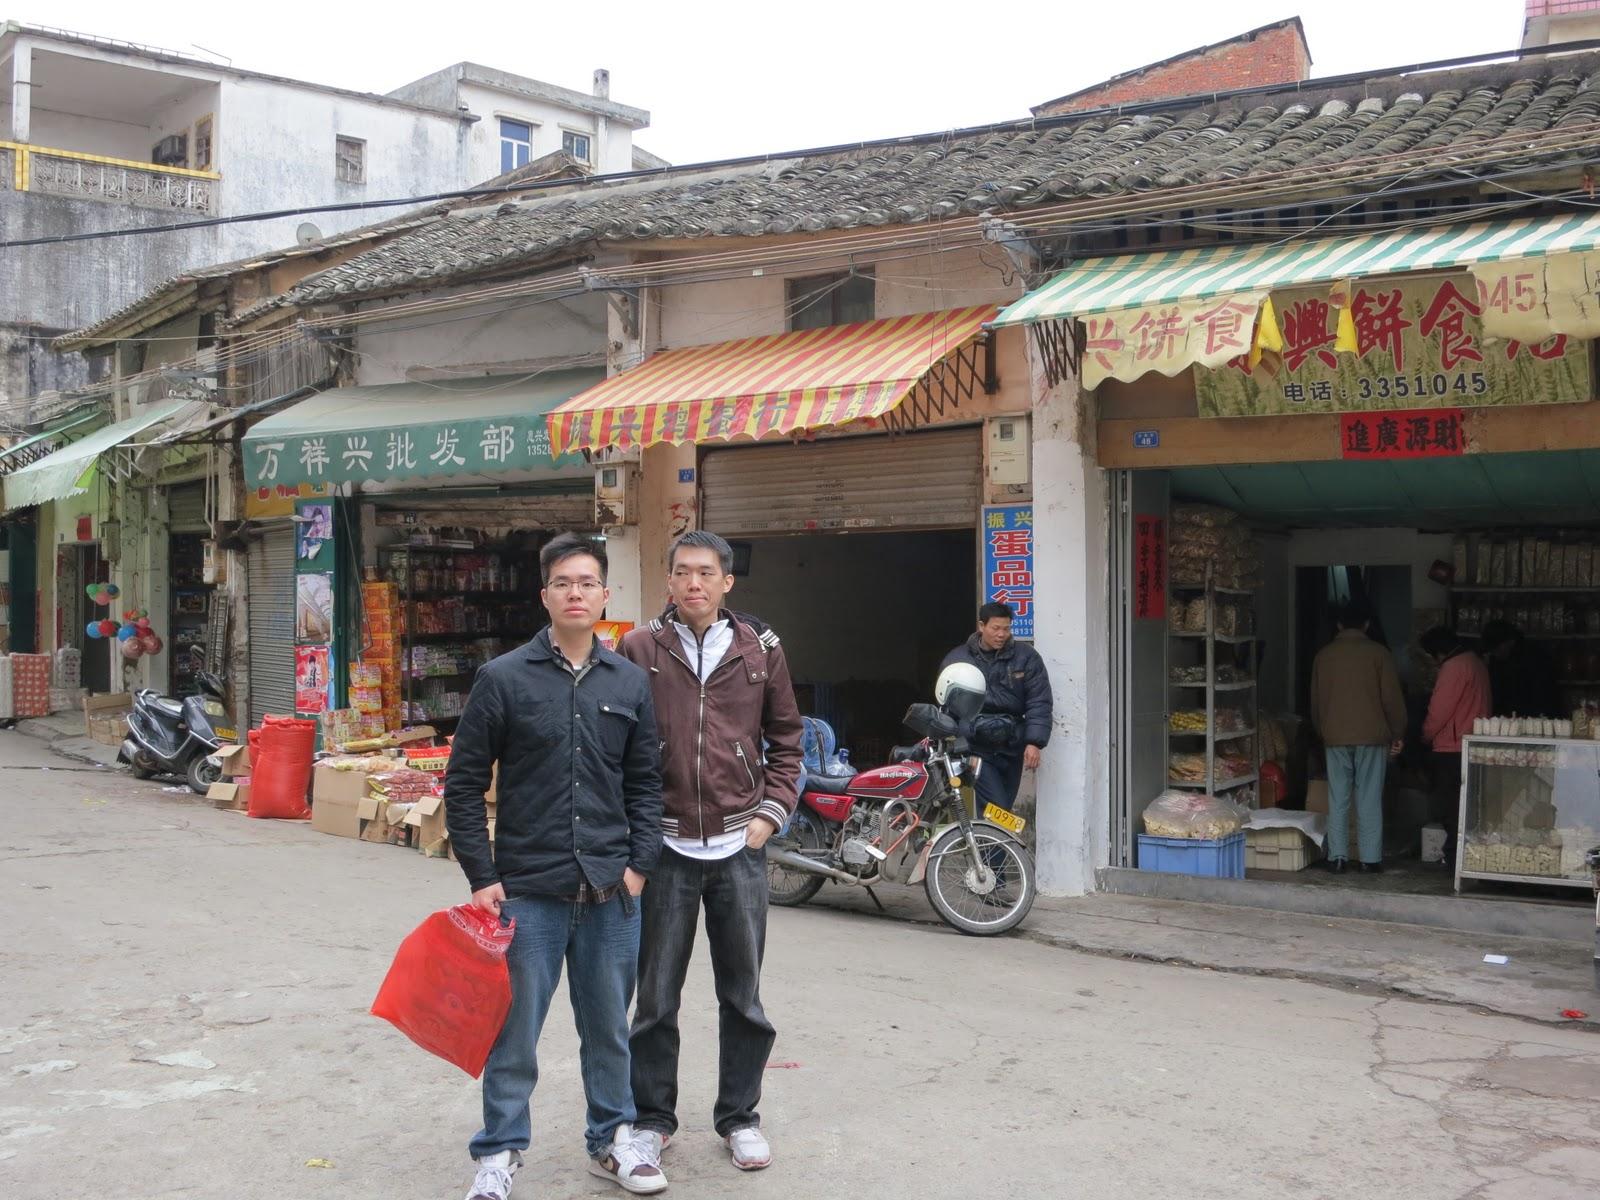 U7af9 U5347 U4ed4 U6e38 U4e2d U570b  Huizhou Danshui  Day 1